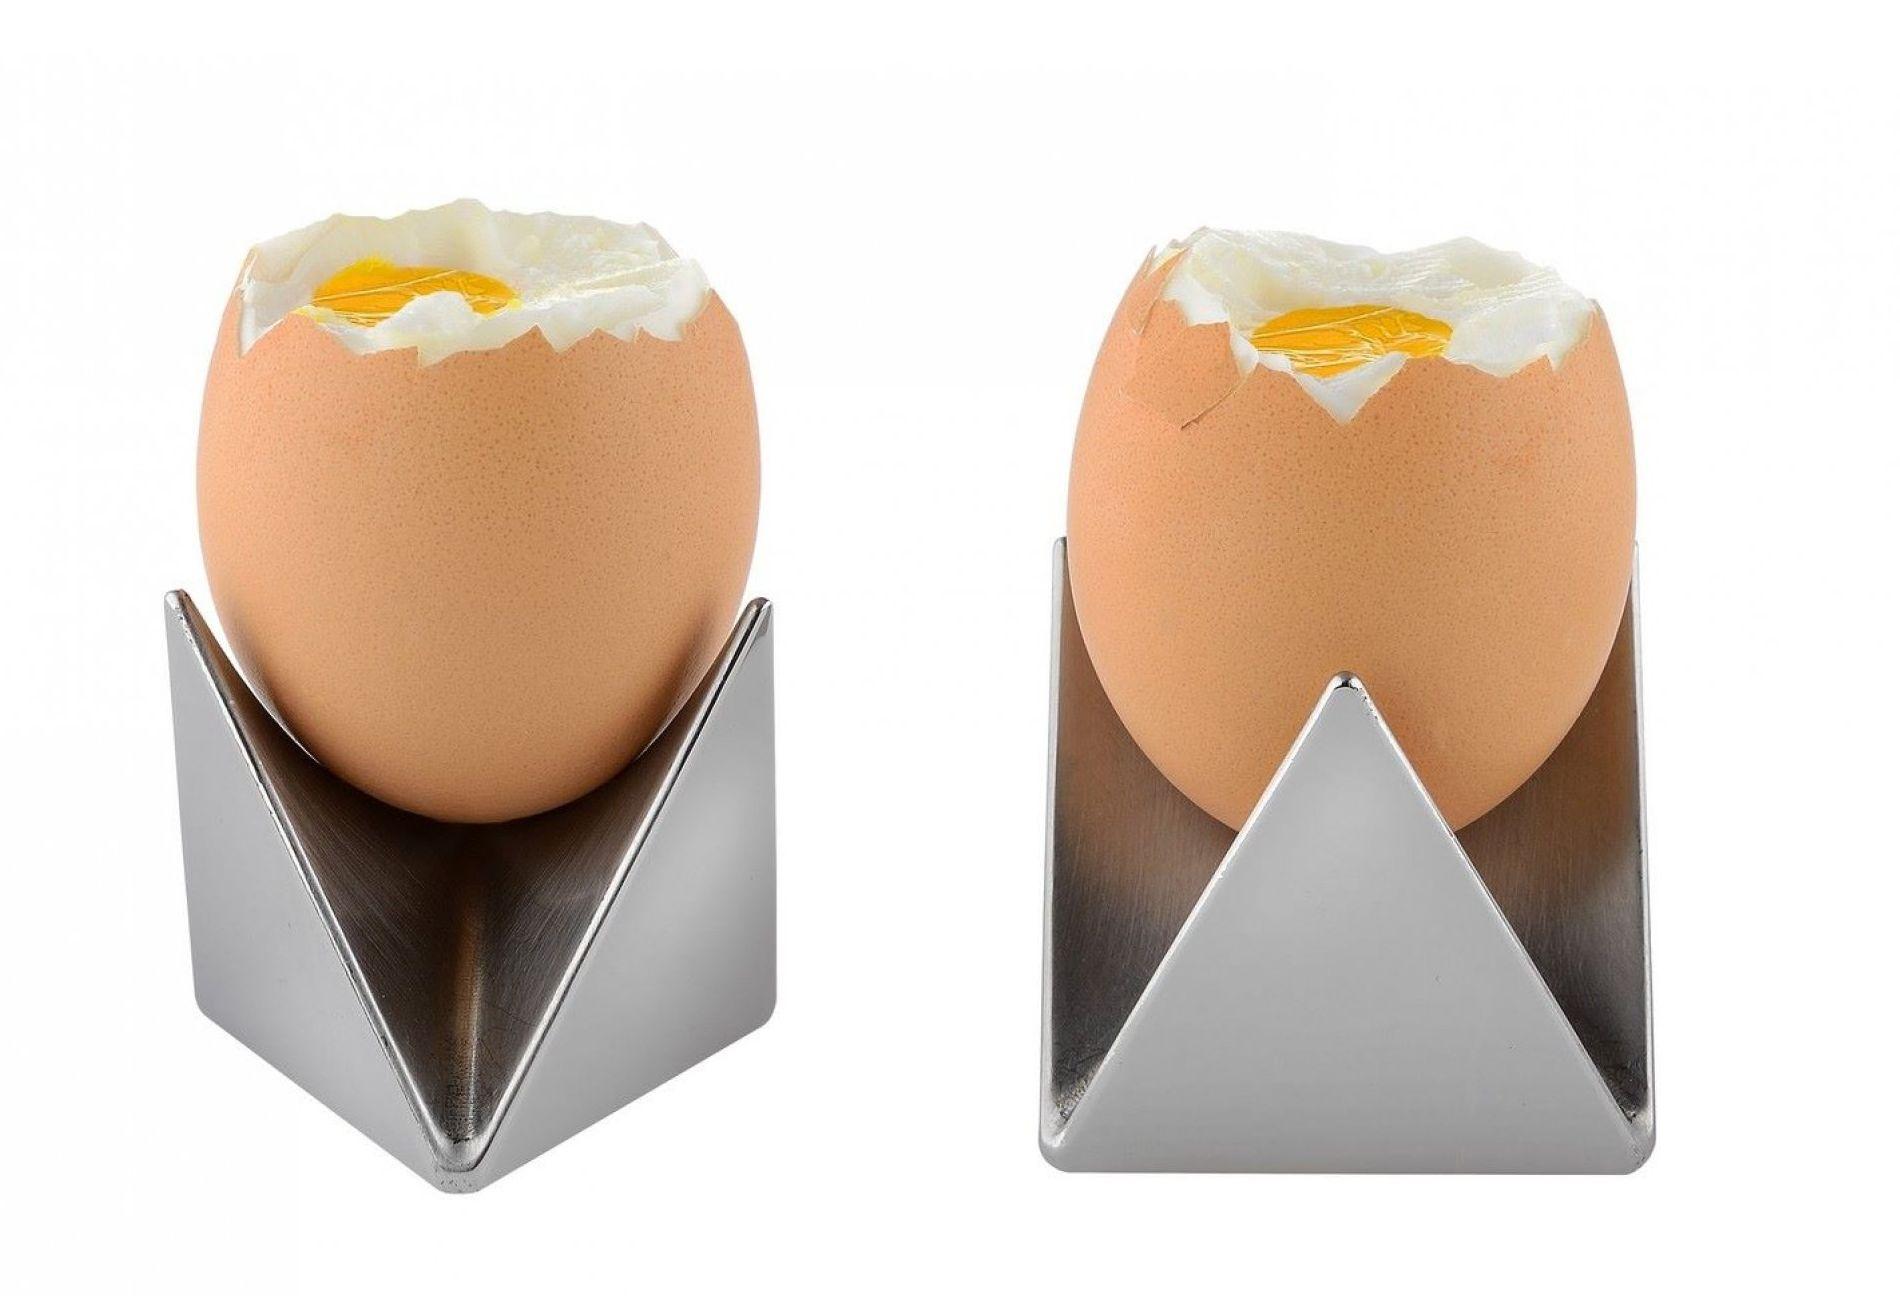 Alessi Roost eierdopjes AGO01 - 2 stuks